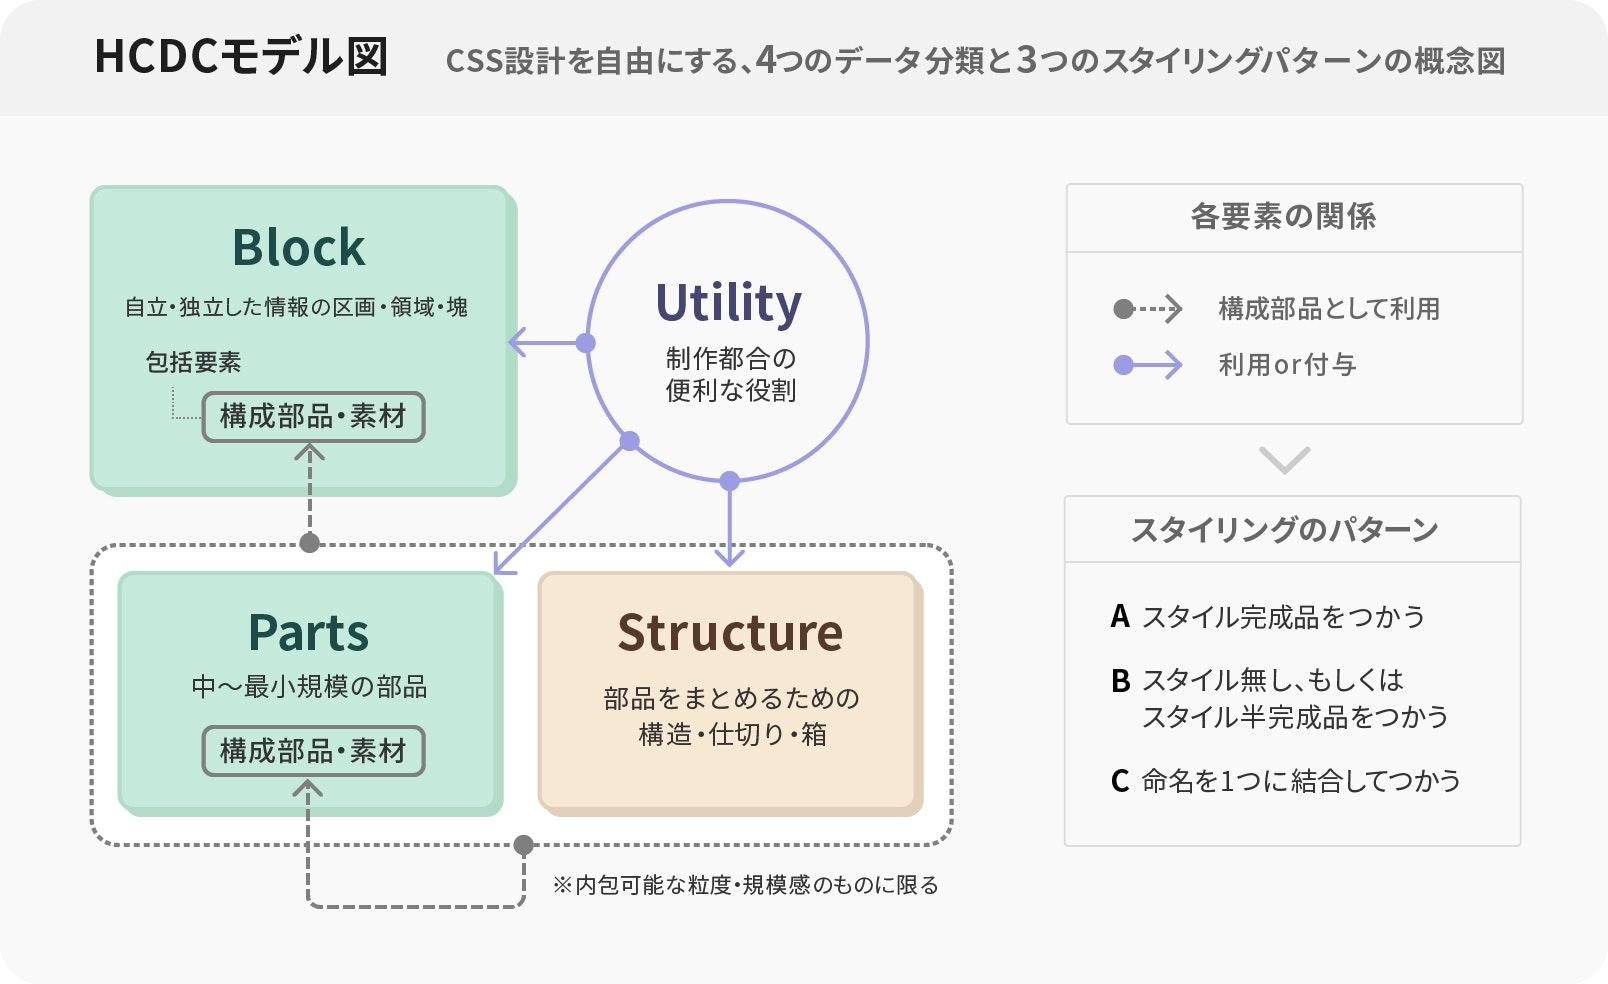 HCDCモデル図